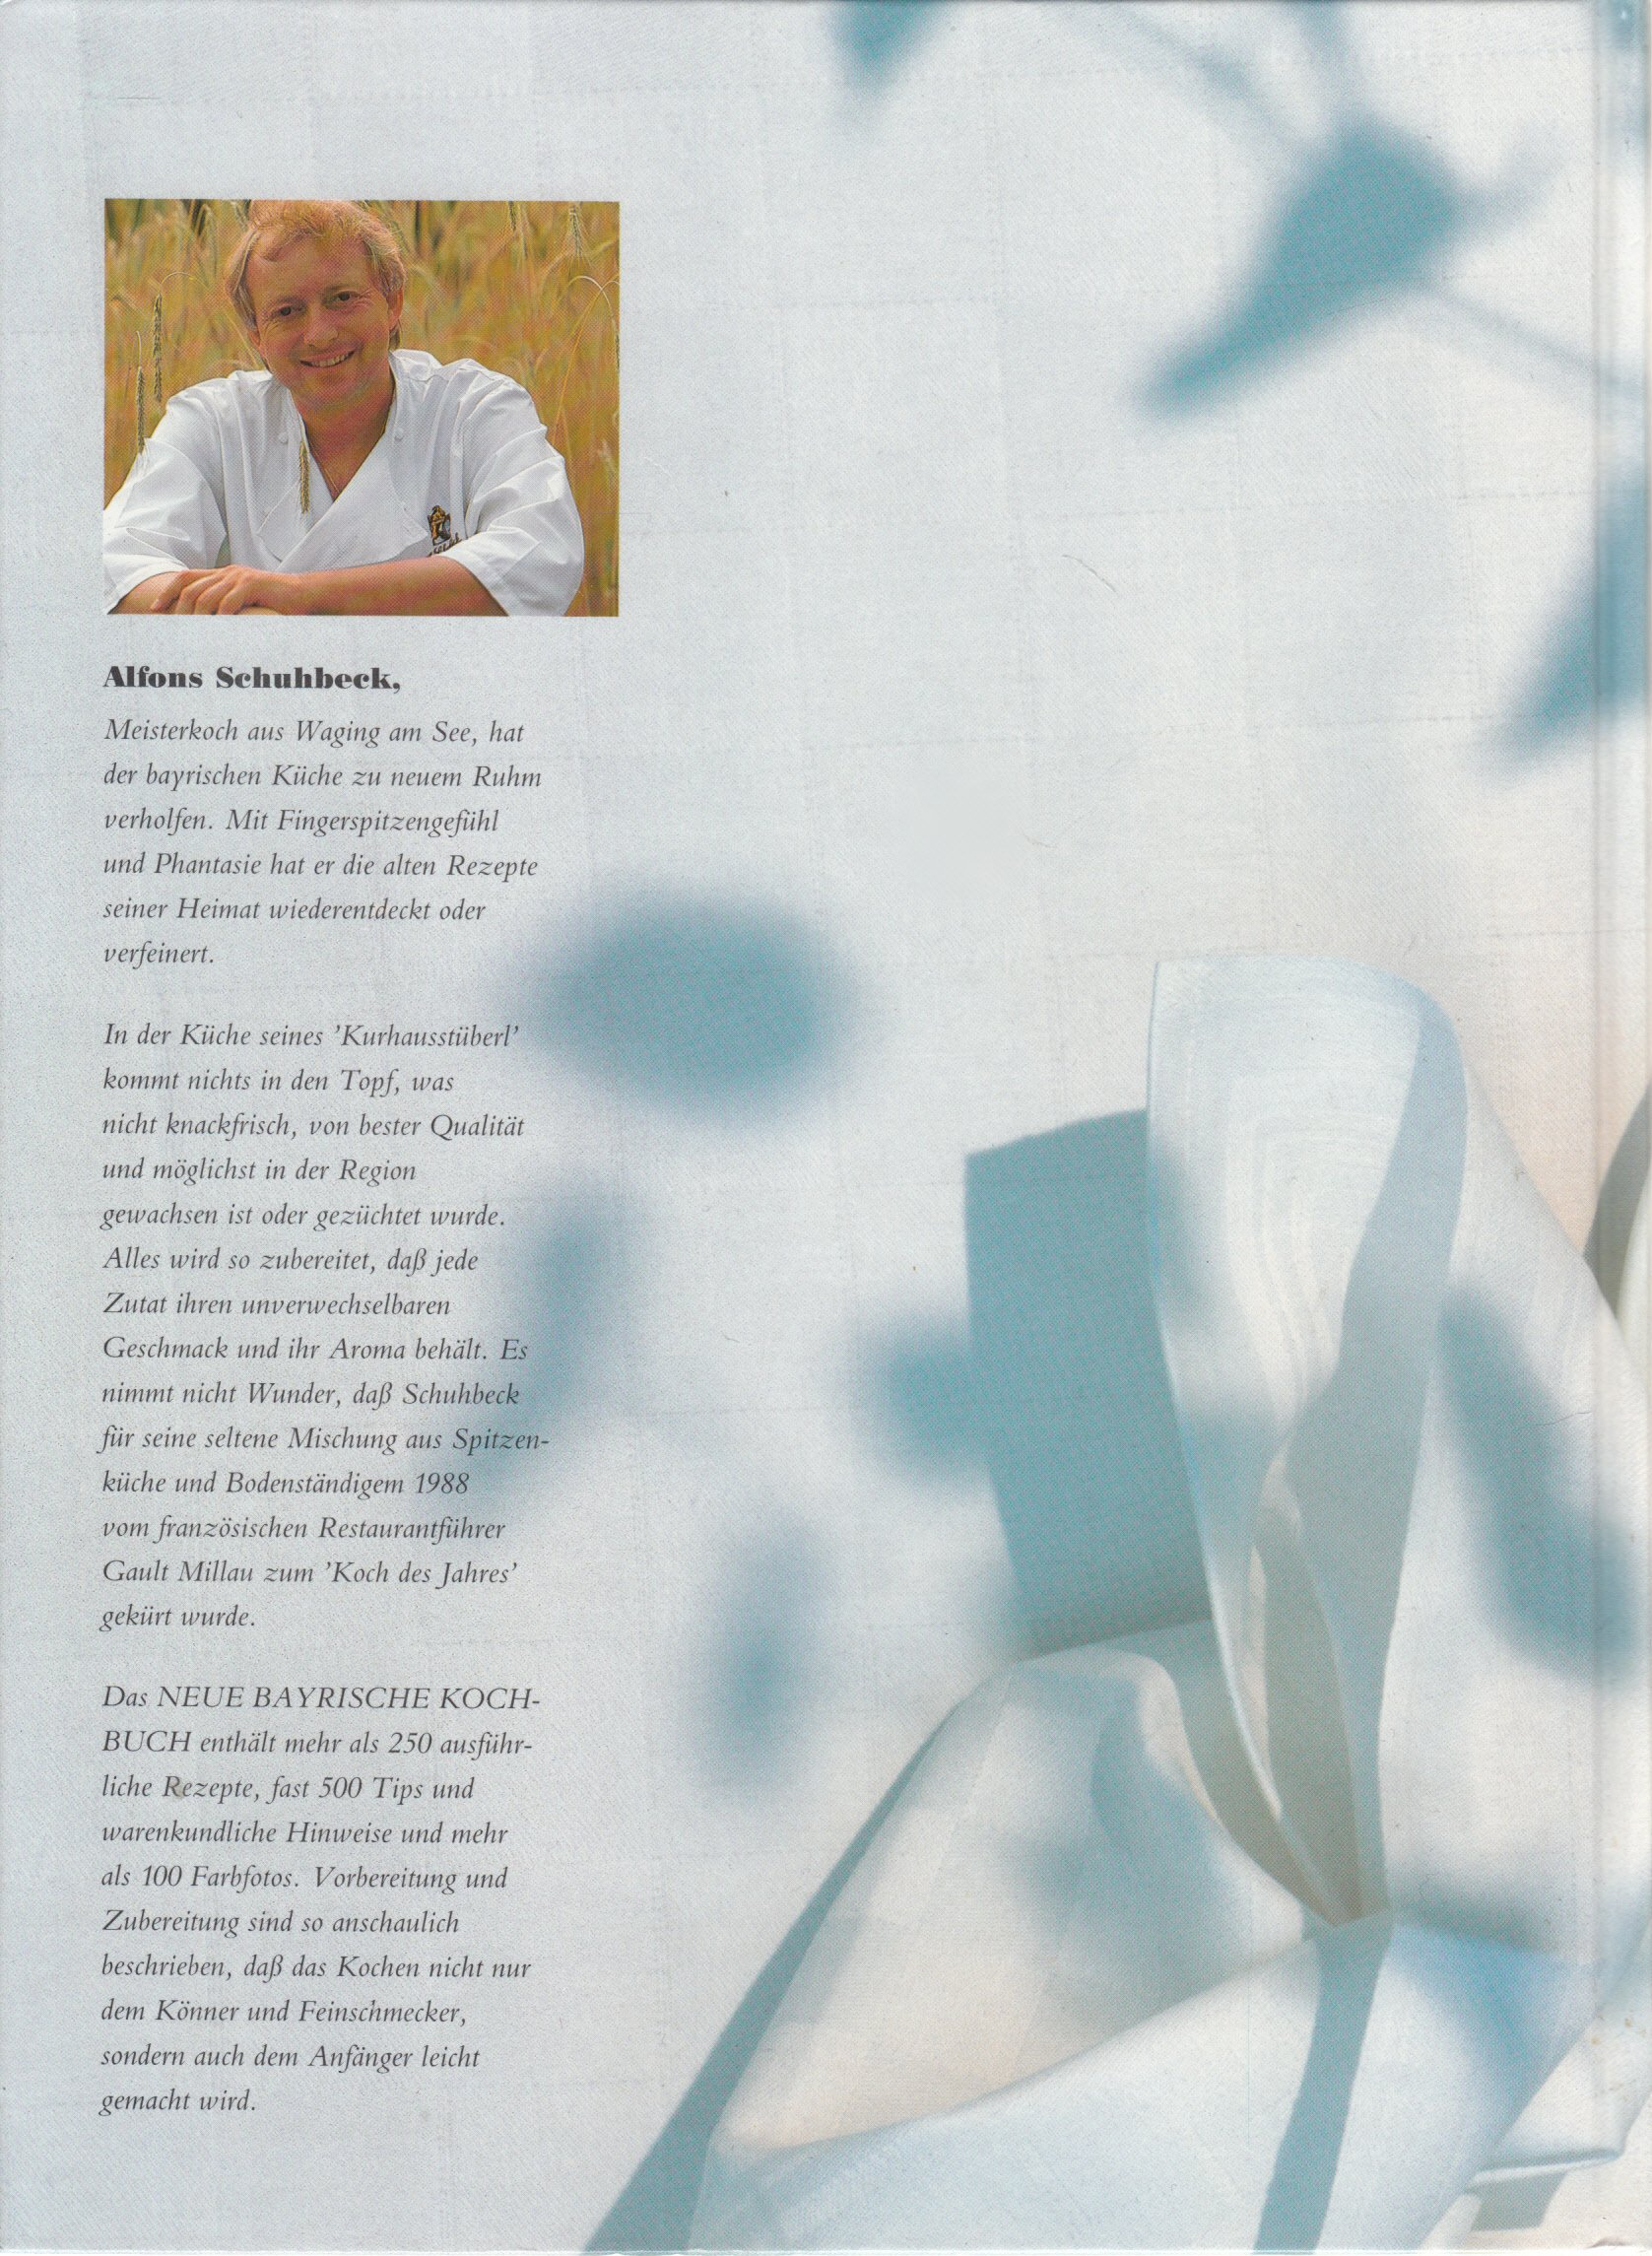 Das neue Bayrische Kochbuch: Amazon.de: Alfons Schuhbeck ...